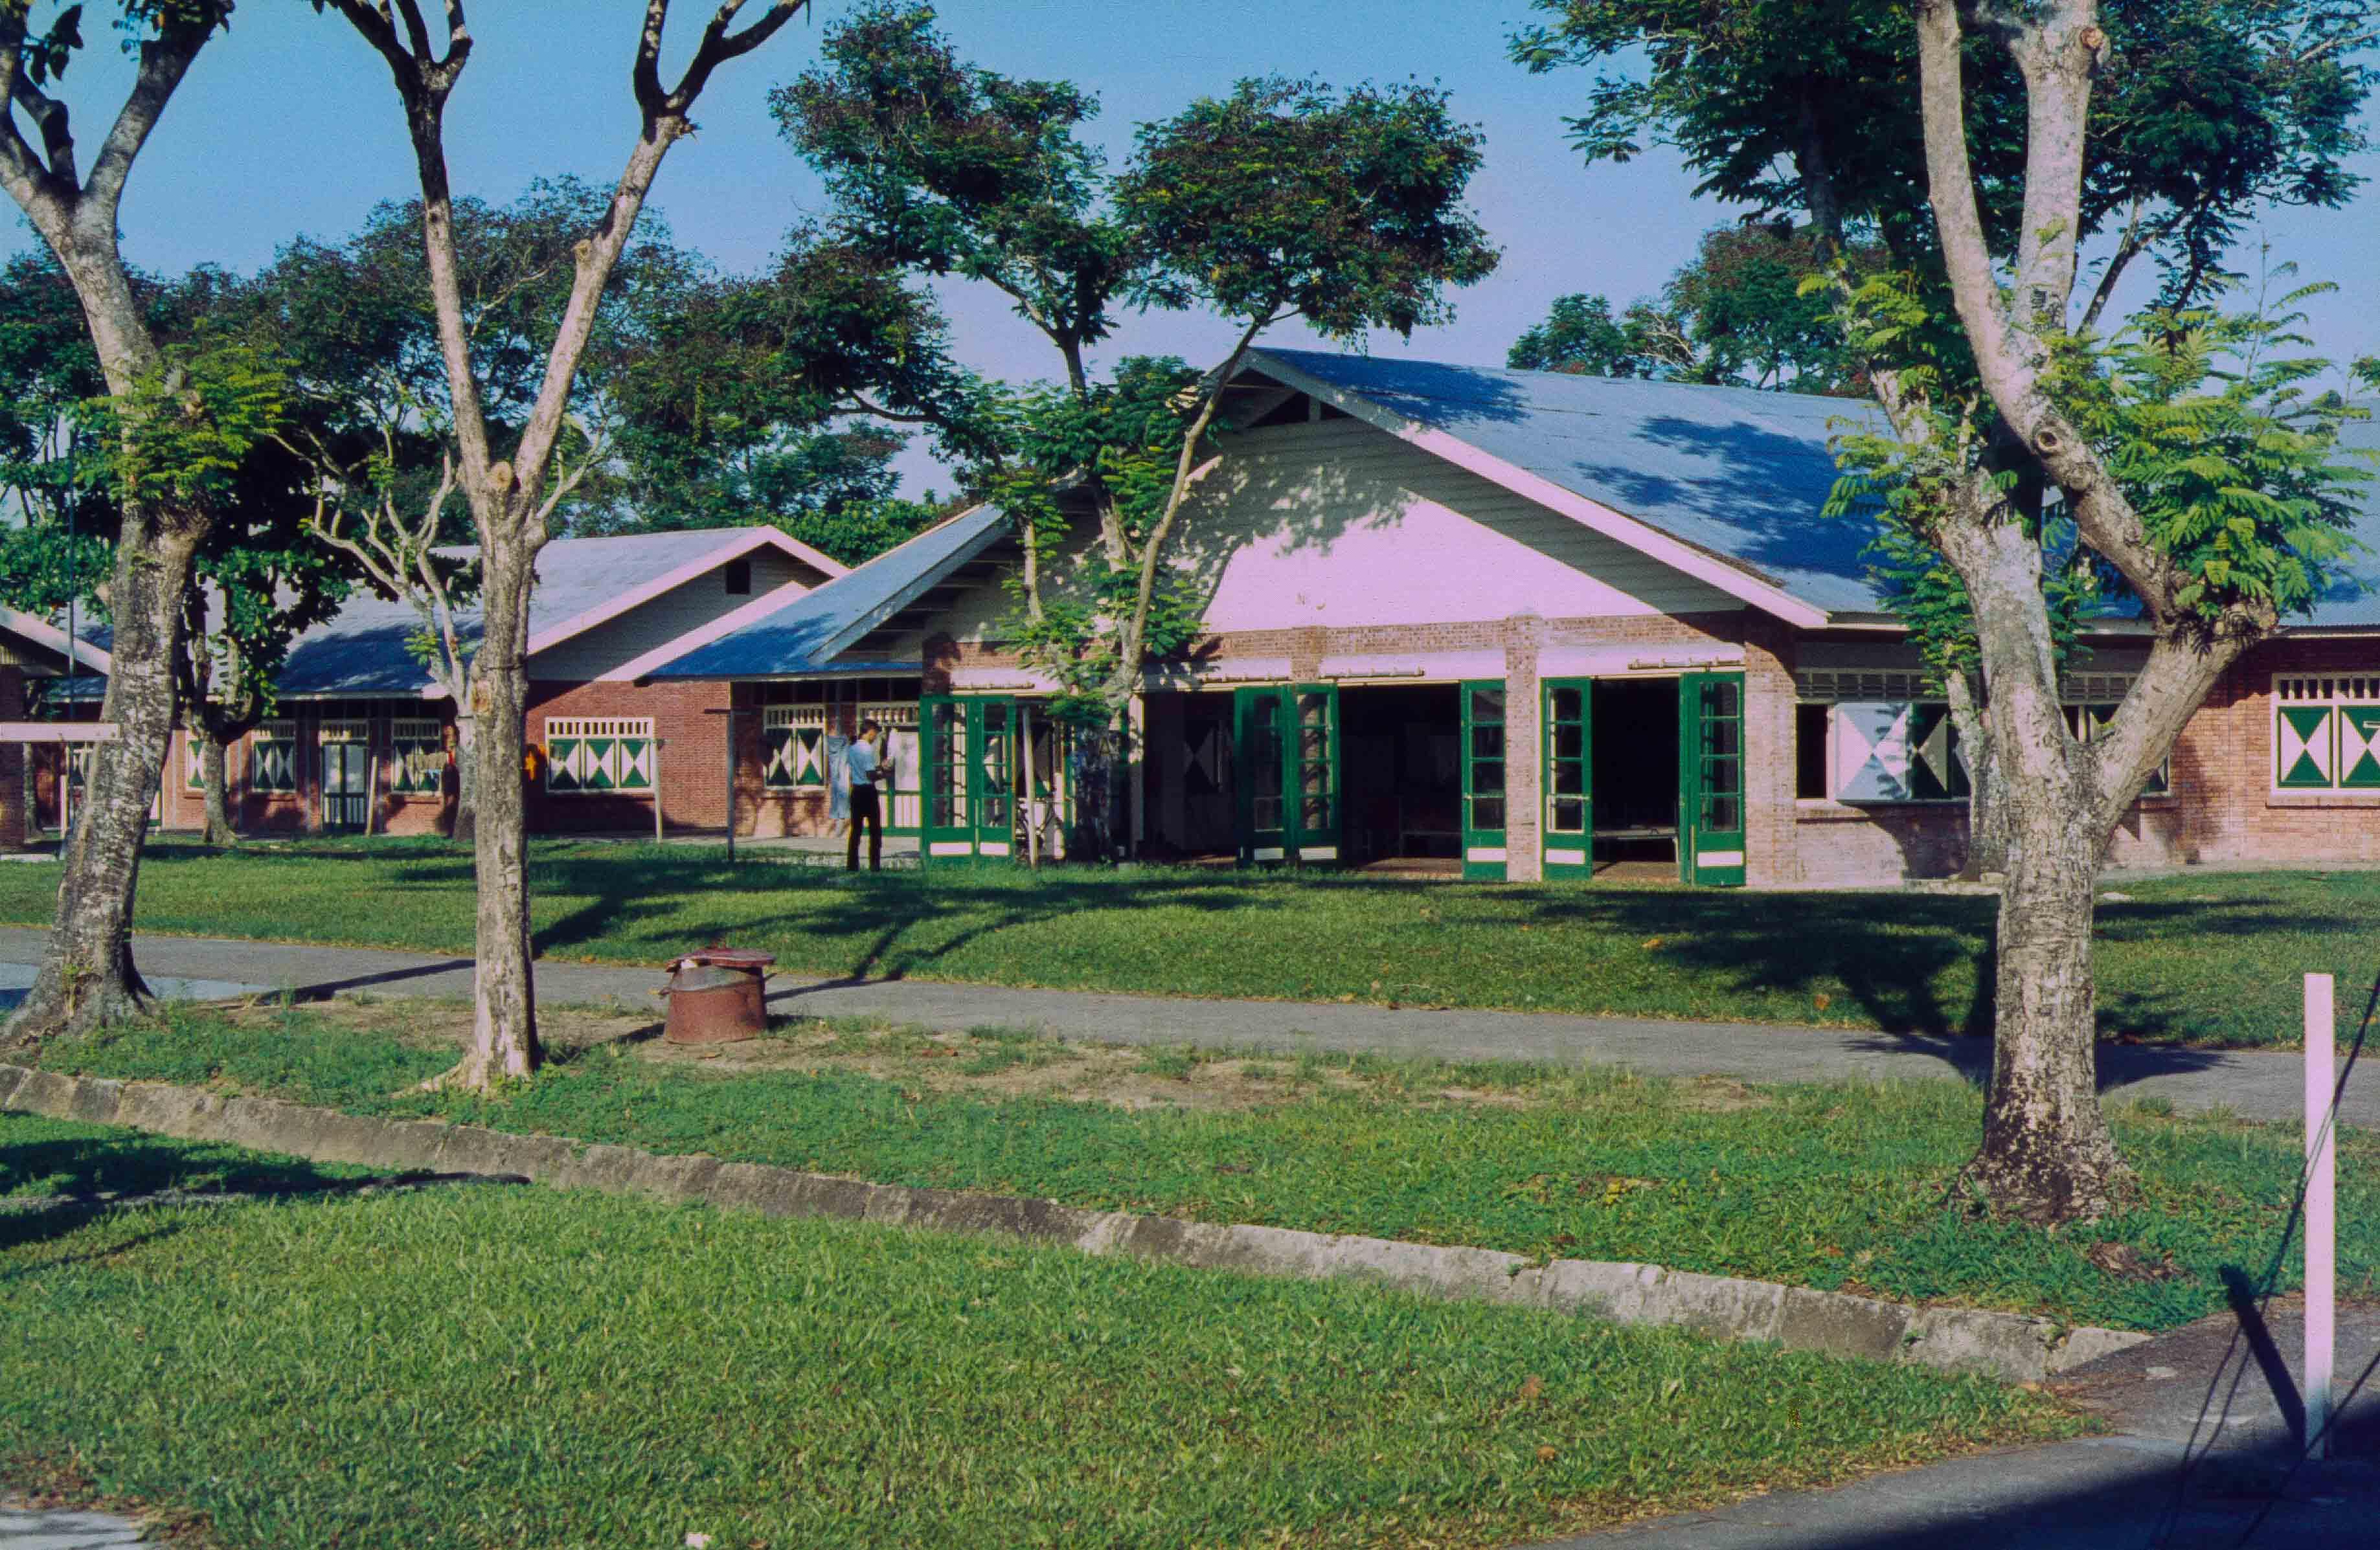 283. Suriname